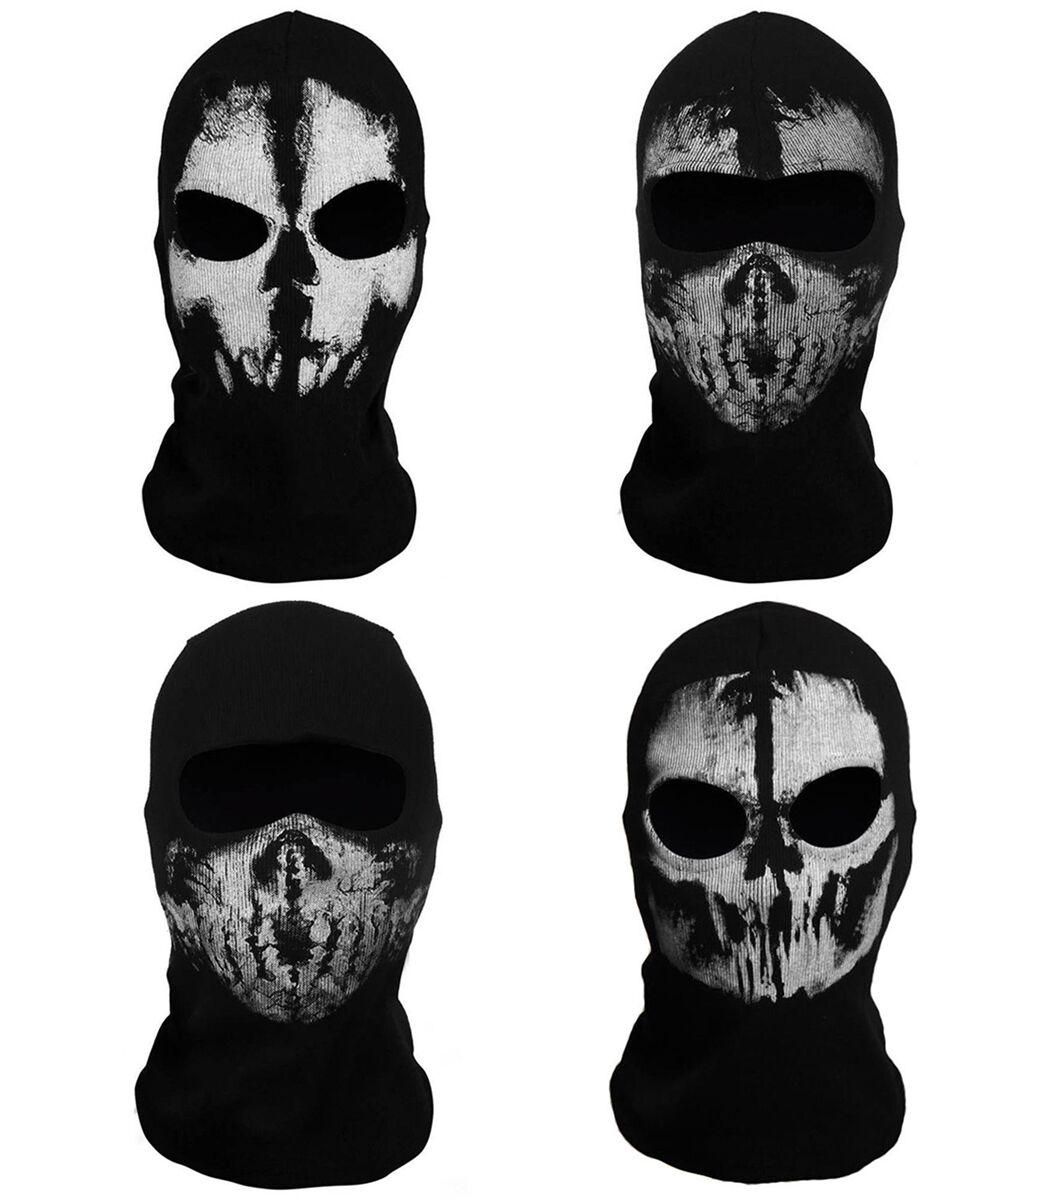 Call of Duty Sturmmaske Sturmhaube Motorrad Fahrrad Biker Ski Sport Maske Helm